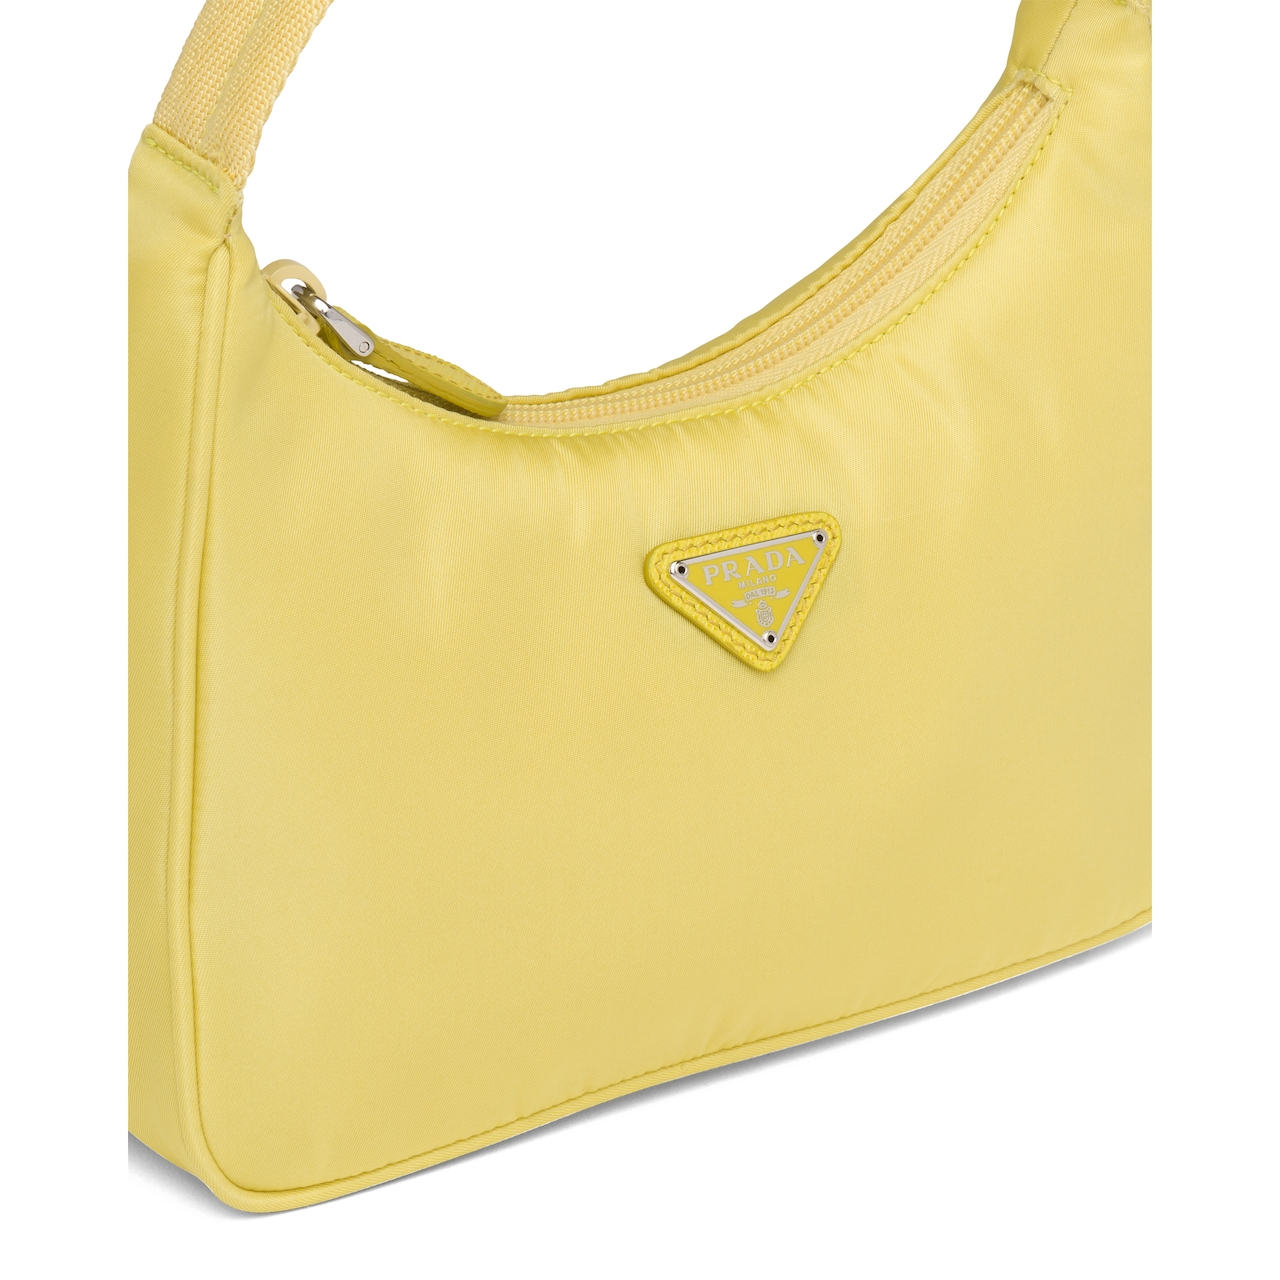 Prada Prada Re-Edition 2000 nylon mini-bag 6